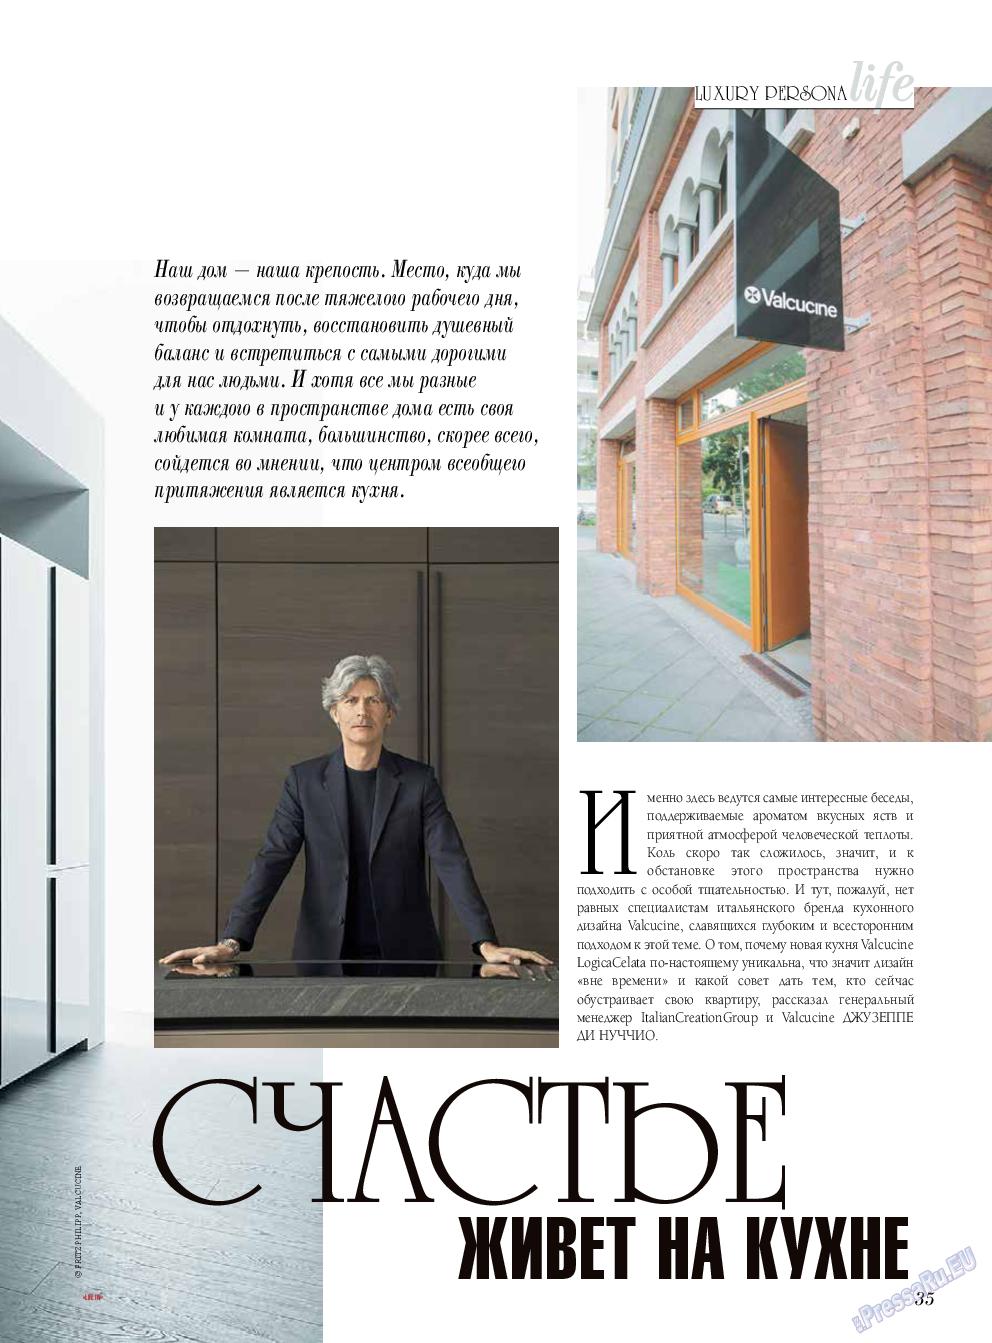 Life in Франкфурт (журнал). 2019 год, номер 44, стр. 35